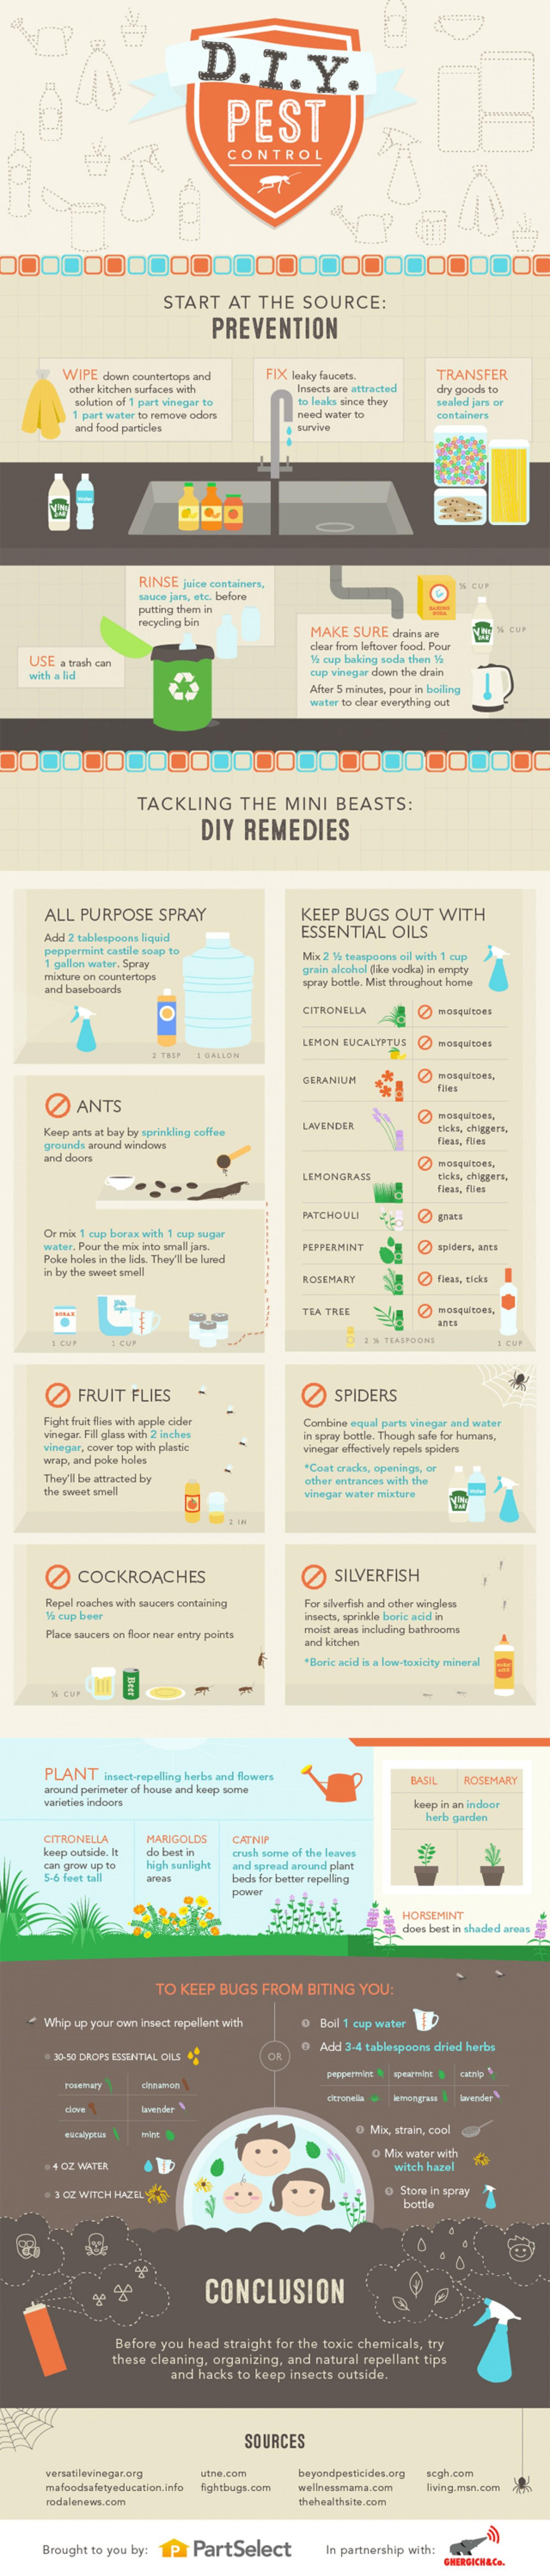 natural repellant tips